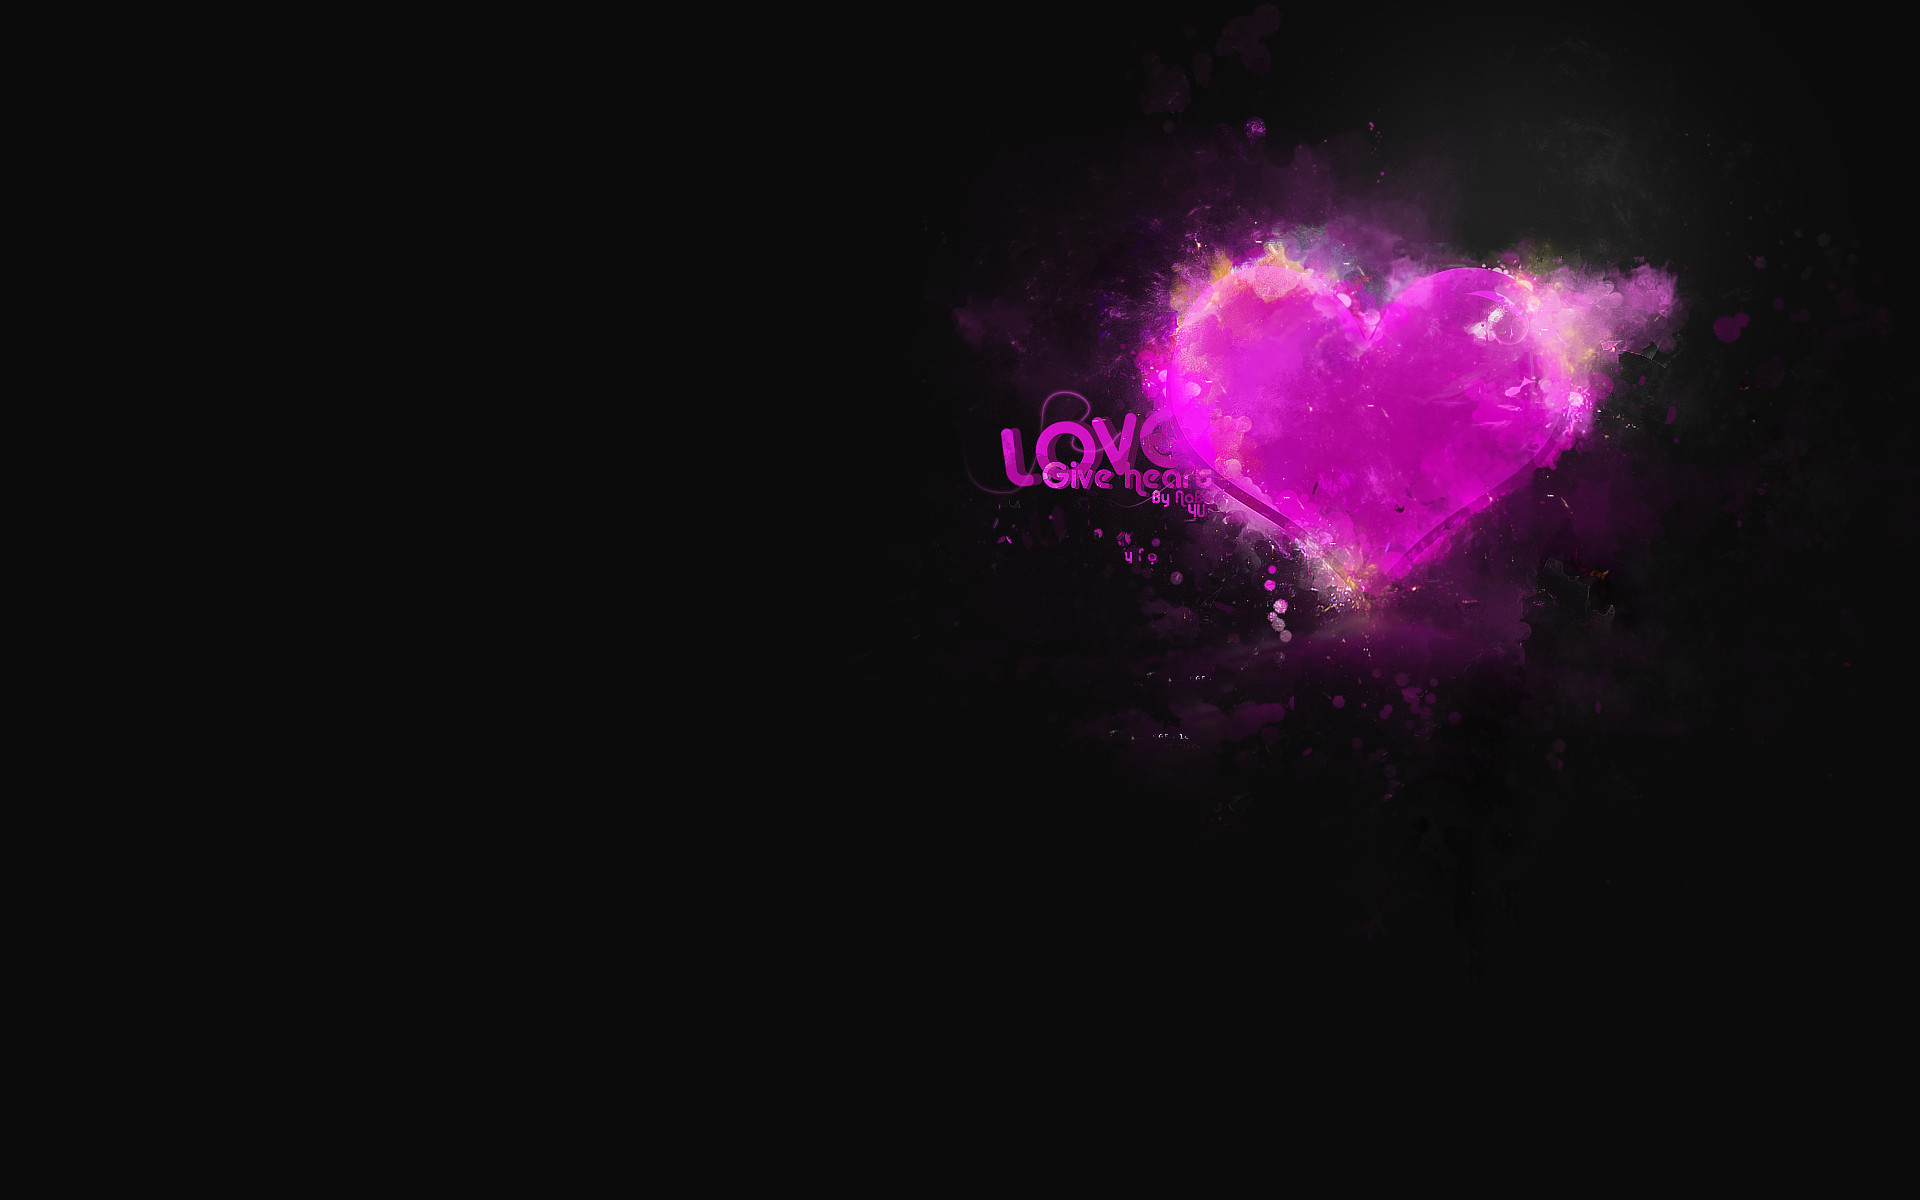 Love Background Black – HDWallie – HD Wallpapers